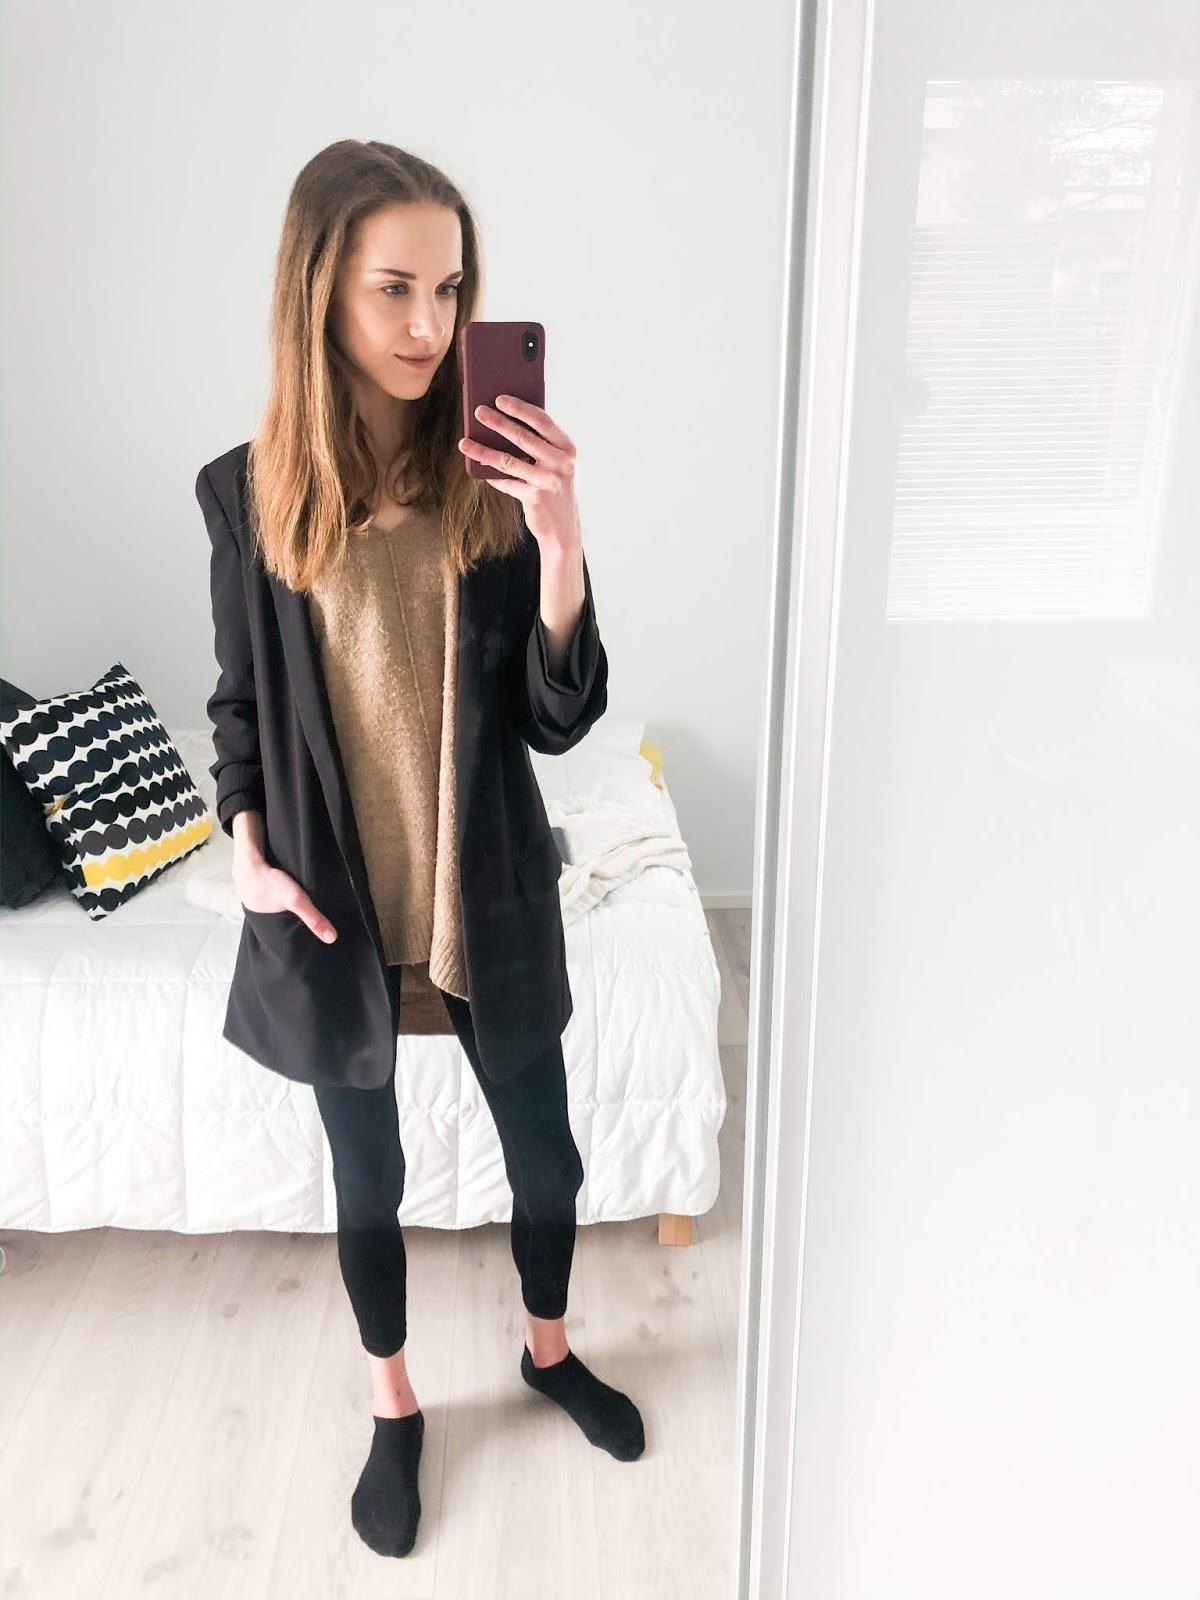 Styling up leggings with a blazer - Leggingsit ja bleiseri, muotibloggaaja, asuinspiraatio